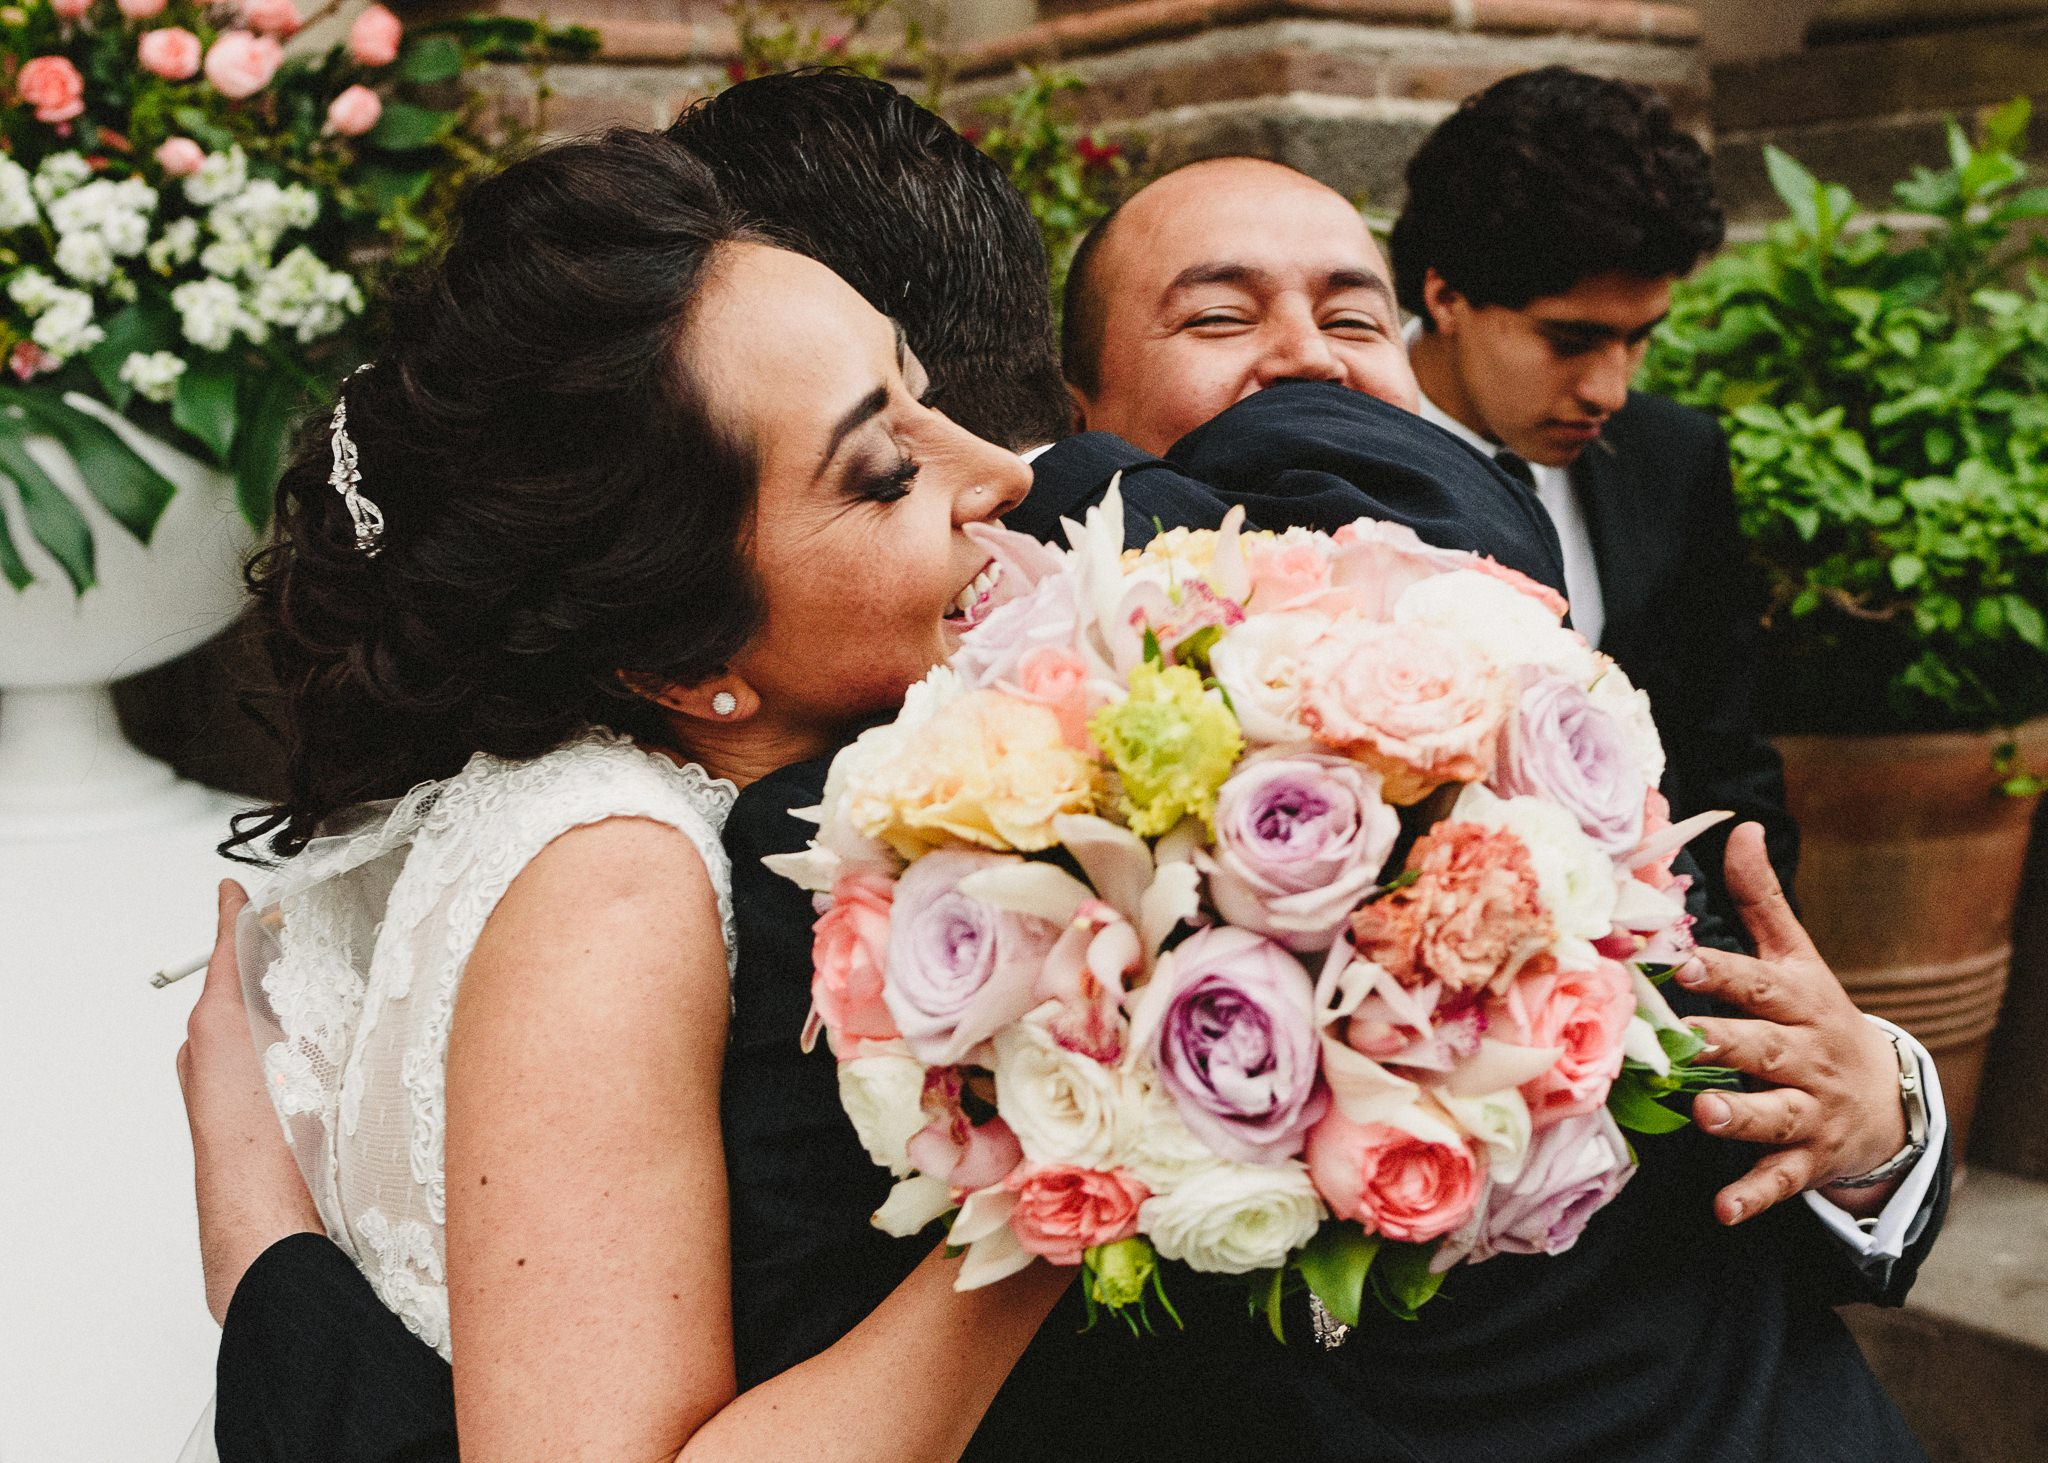 Wedding-Boda-Tulancingo-Hidalgo-Salon-Essenzia-Luis-Houdin-34-film